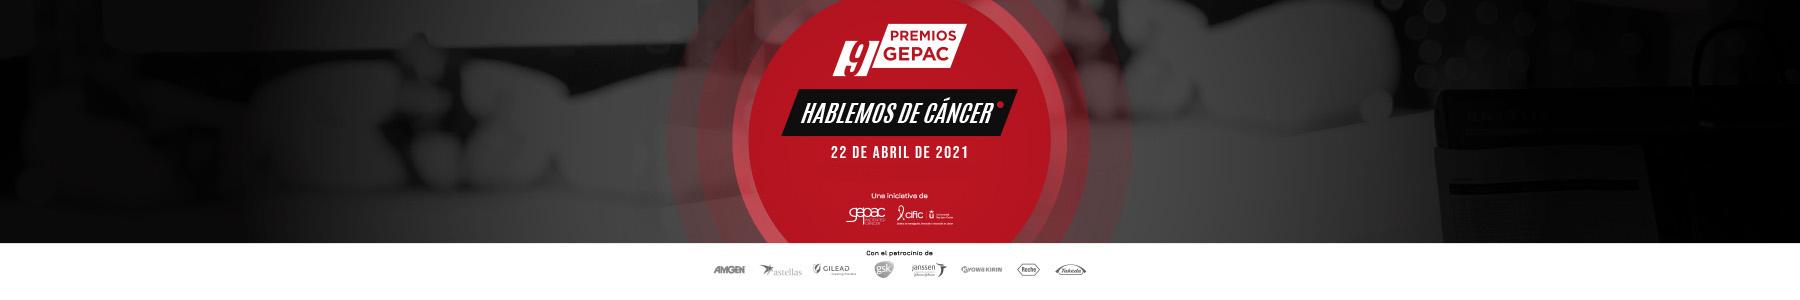 banner-aeal-9-premios-gepac-2021-1